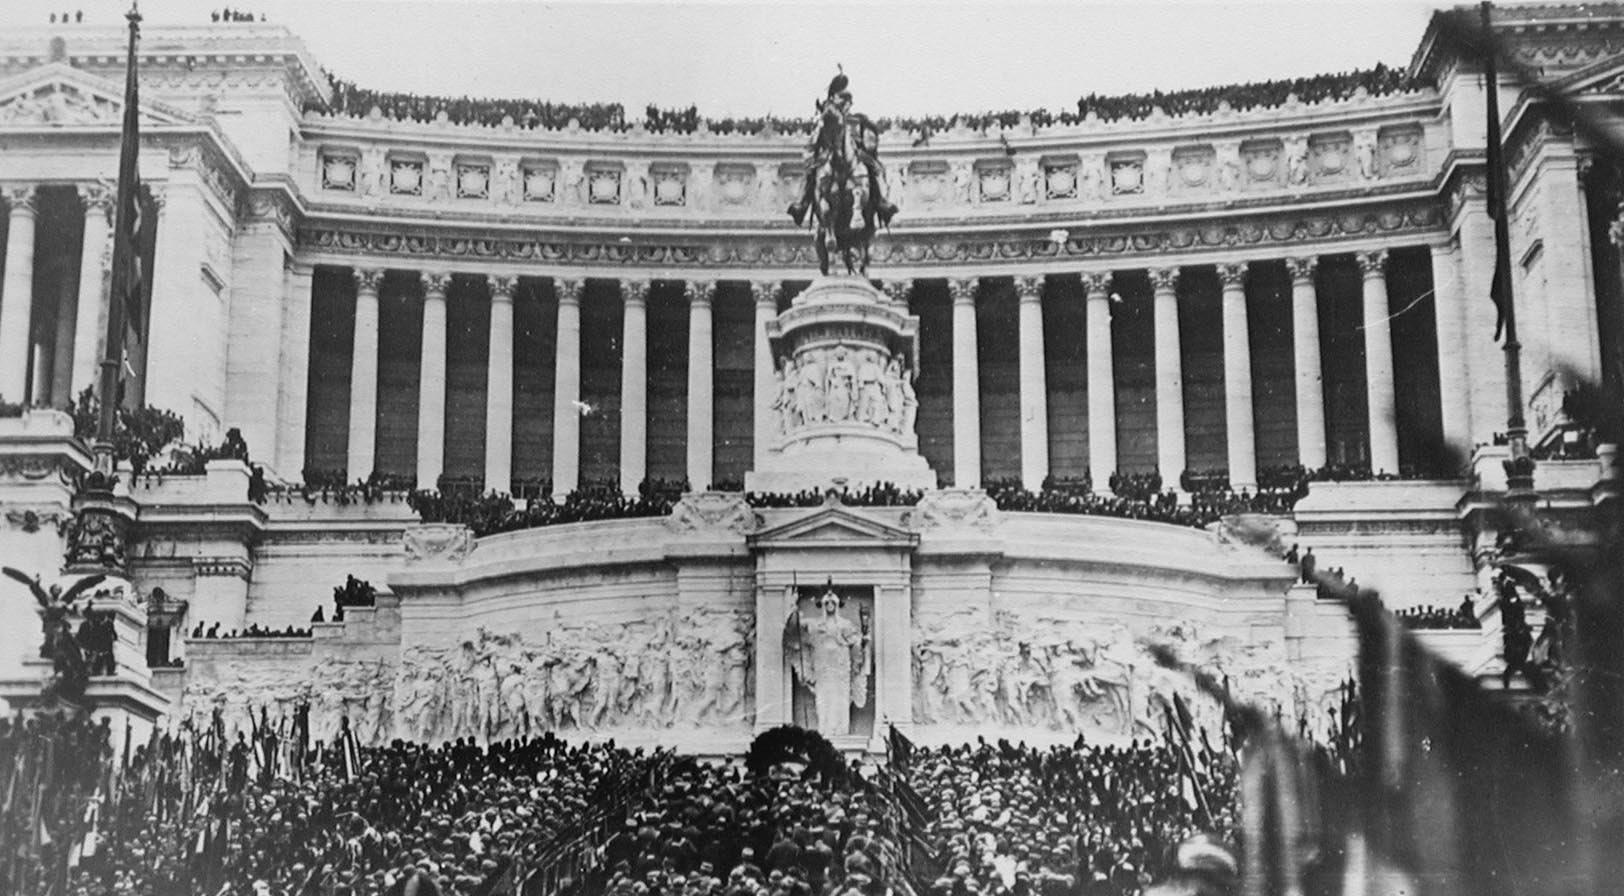 cerimonia tumulazione milite ignoto 1921